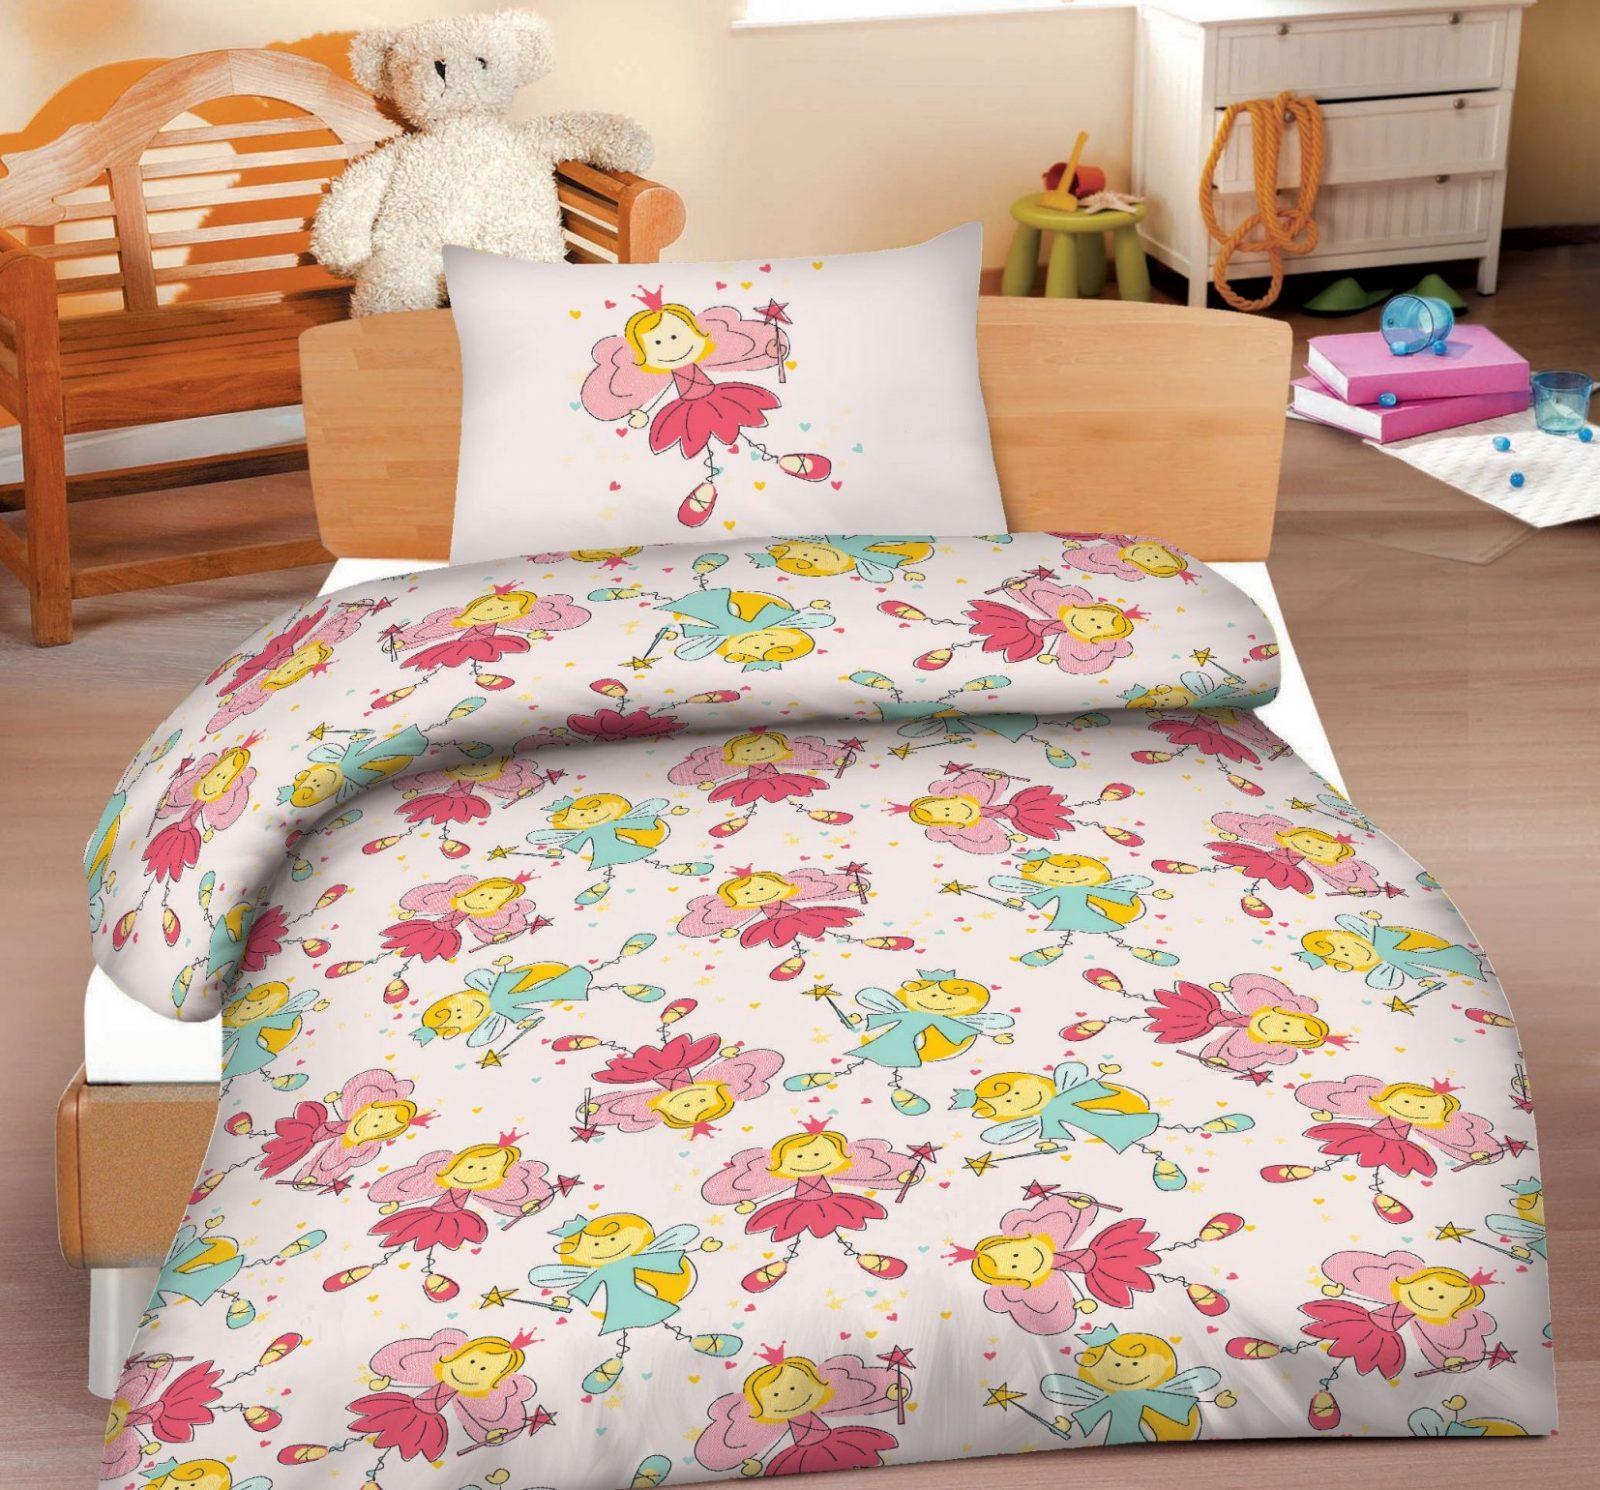 Biber Kinderbettwäsche Bettwäsche 100X135 Feen 398060  Bettwäsche von Bettwäsche 100X135 Biber Bild